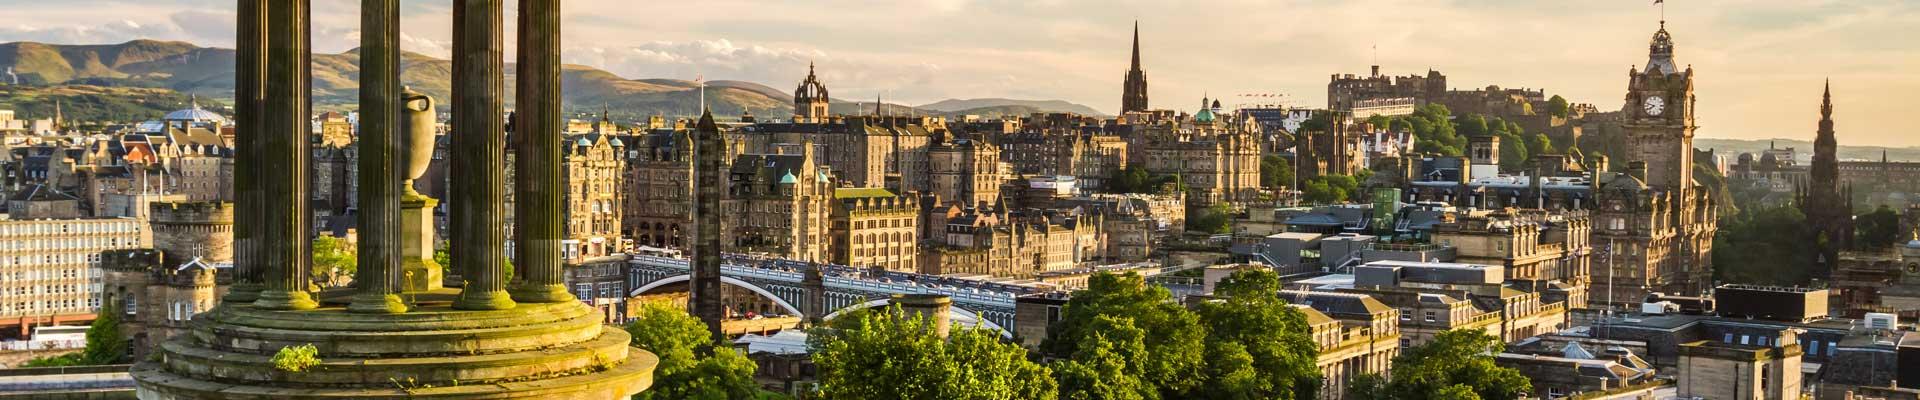 Edimburgo en Residencia